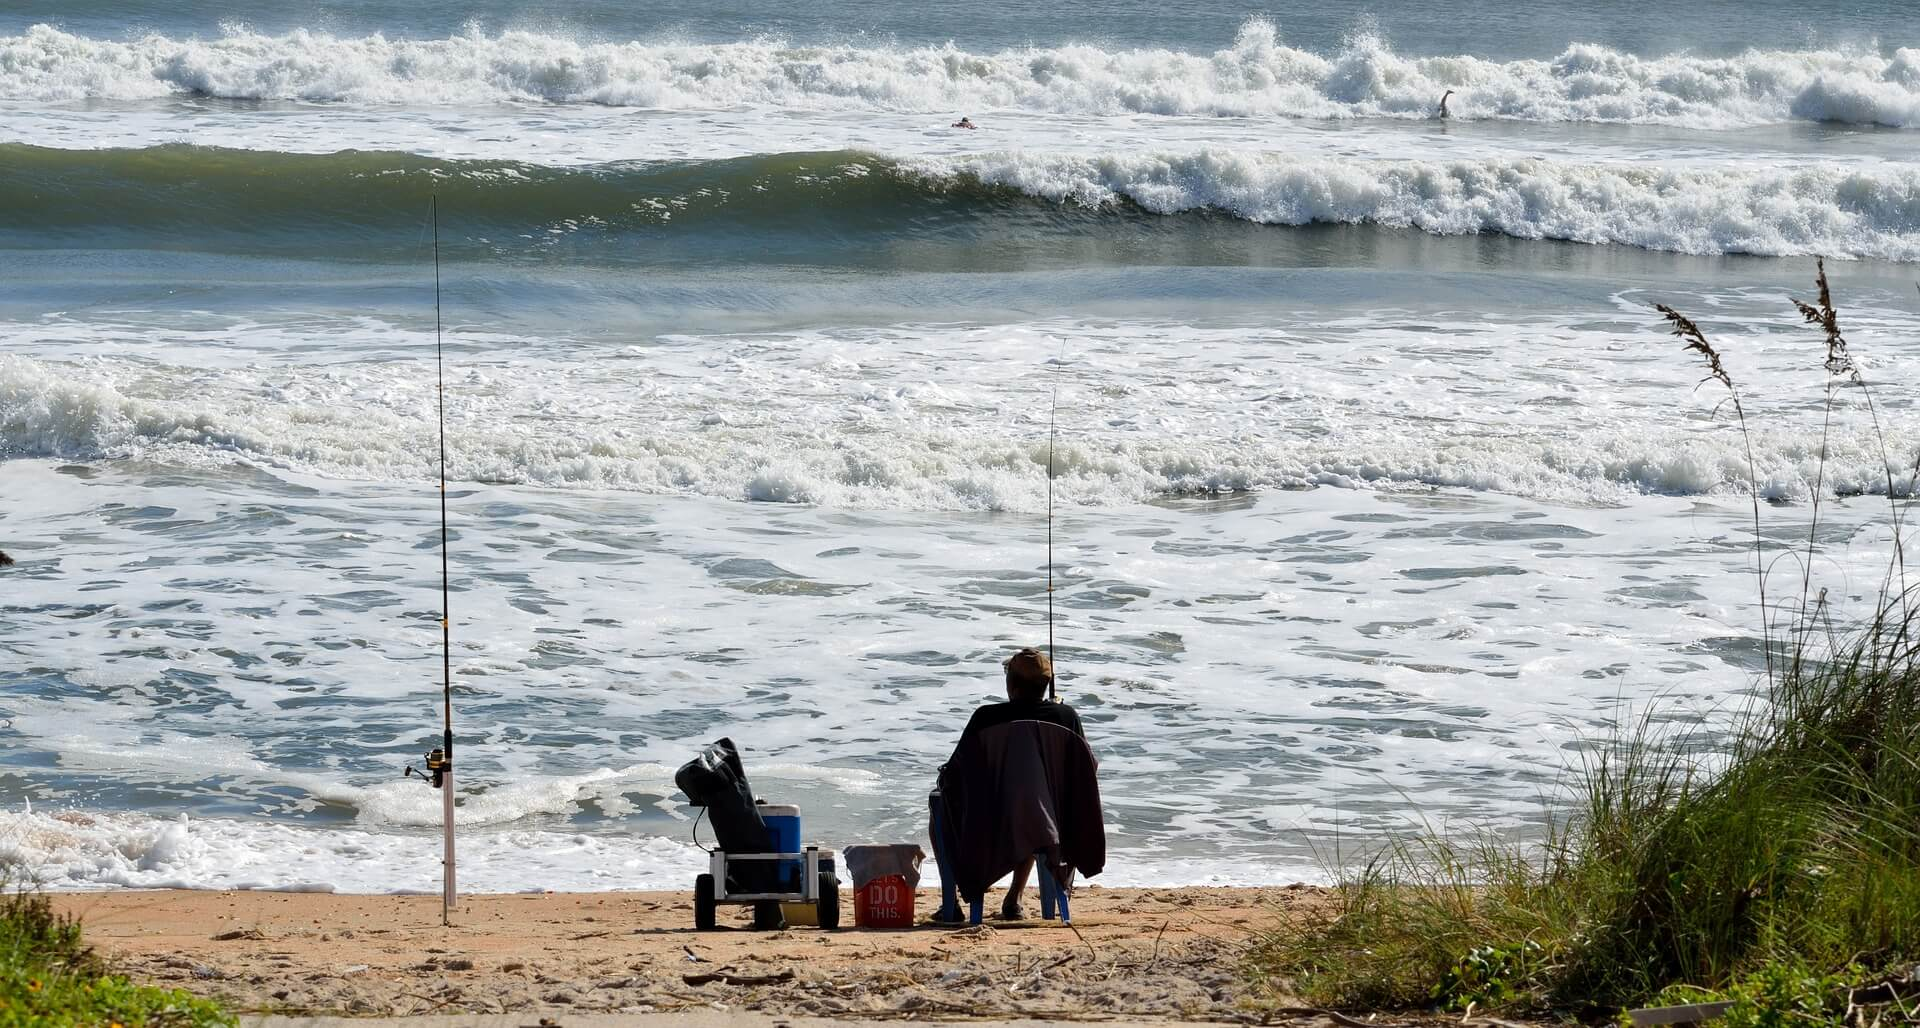 fisherman surf fishing in the beach